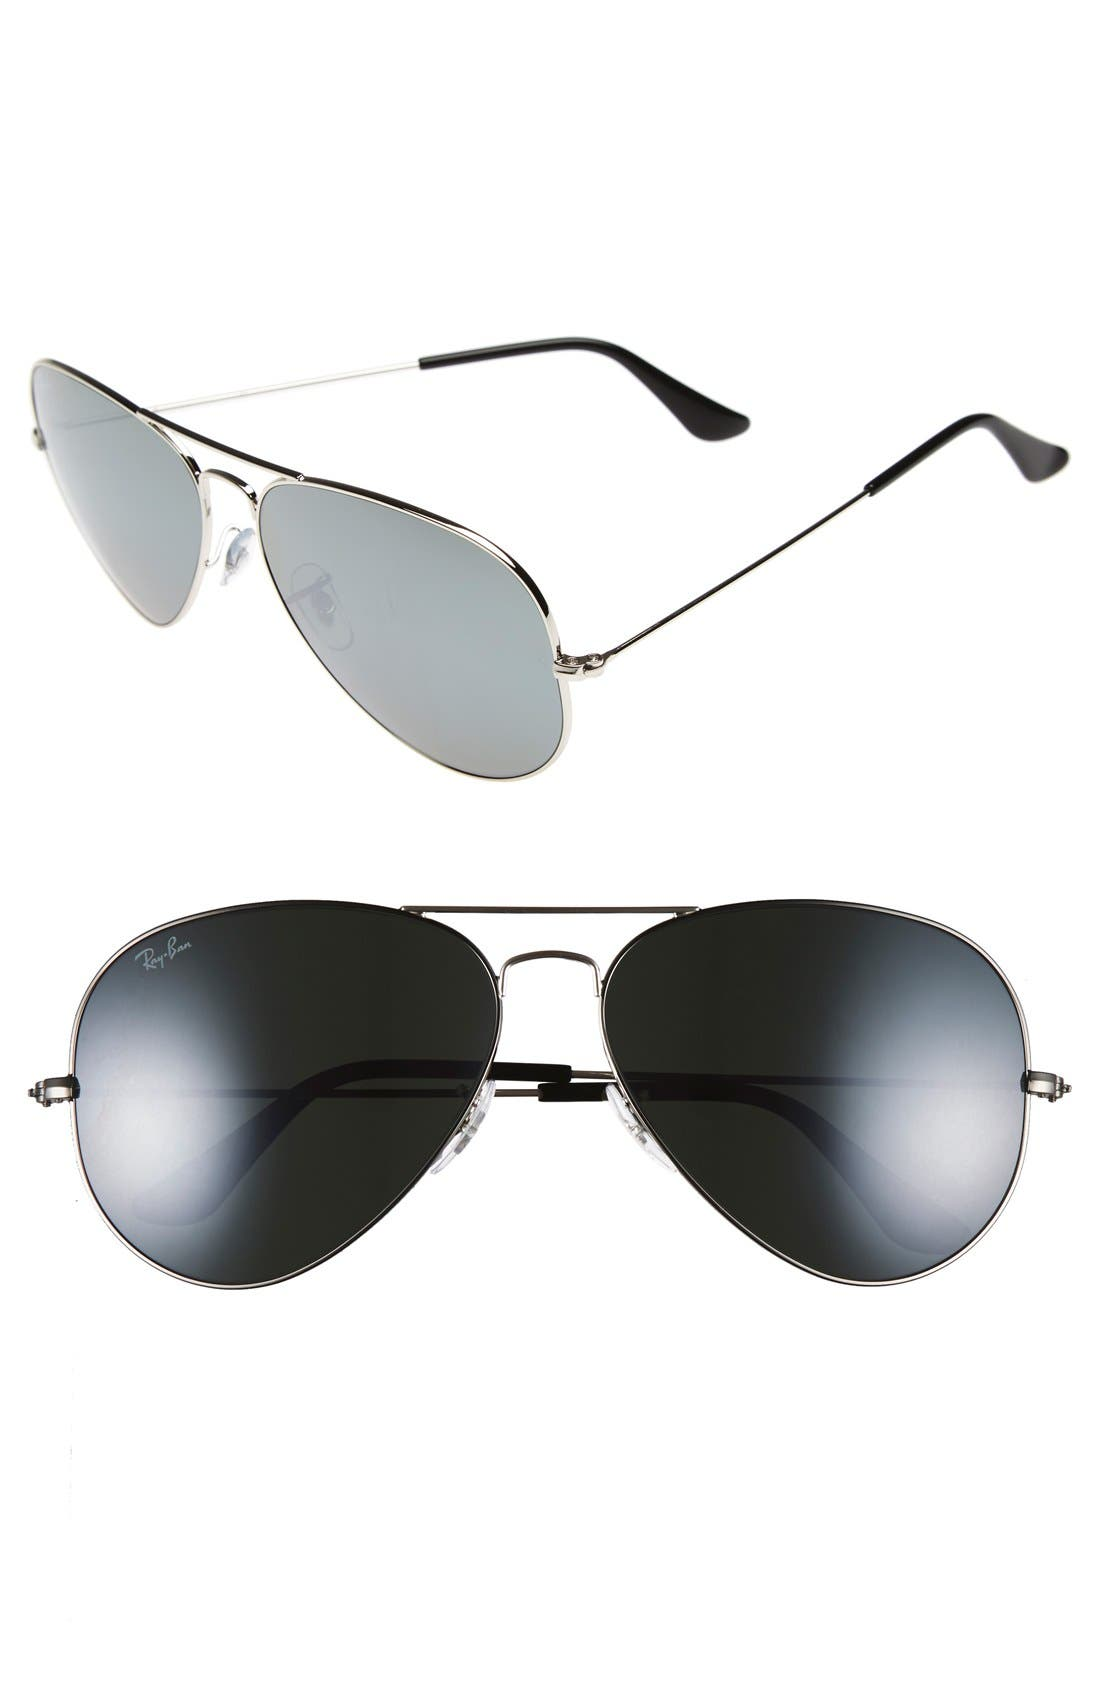 62mm Aviator Sunglasses,                         Main,                         color, Grey Silver Mirror